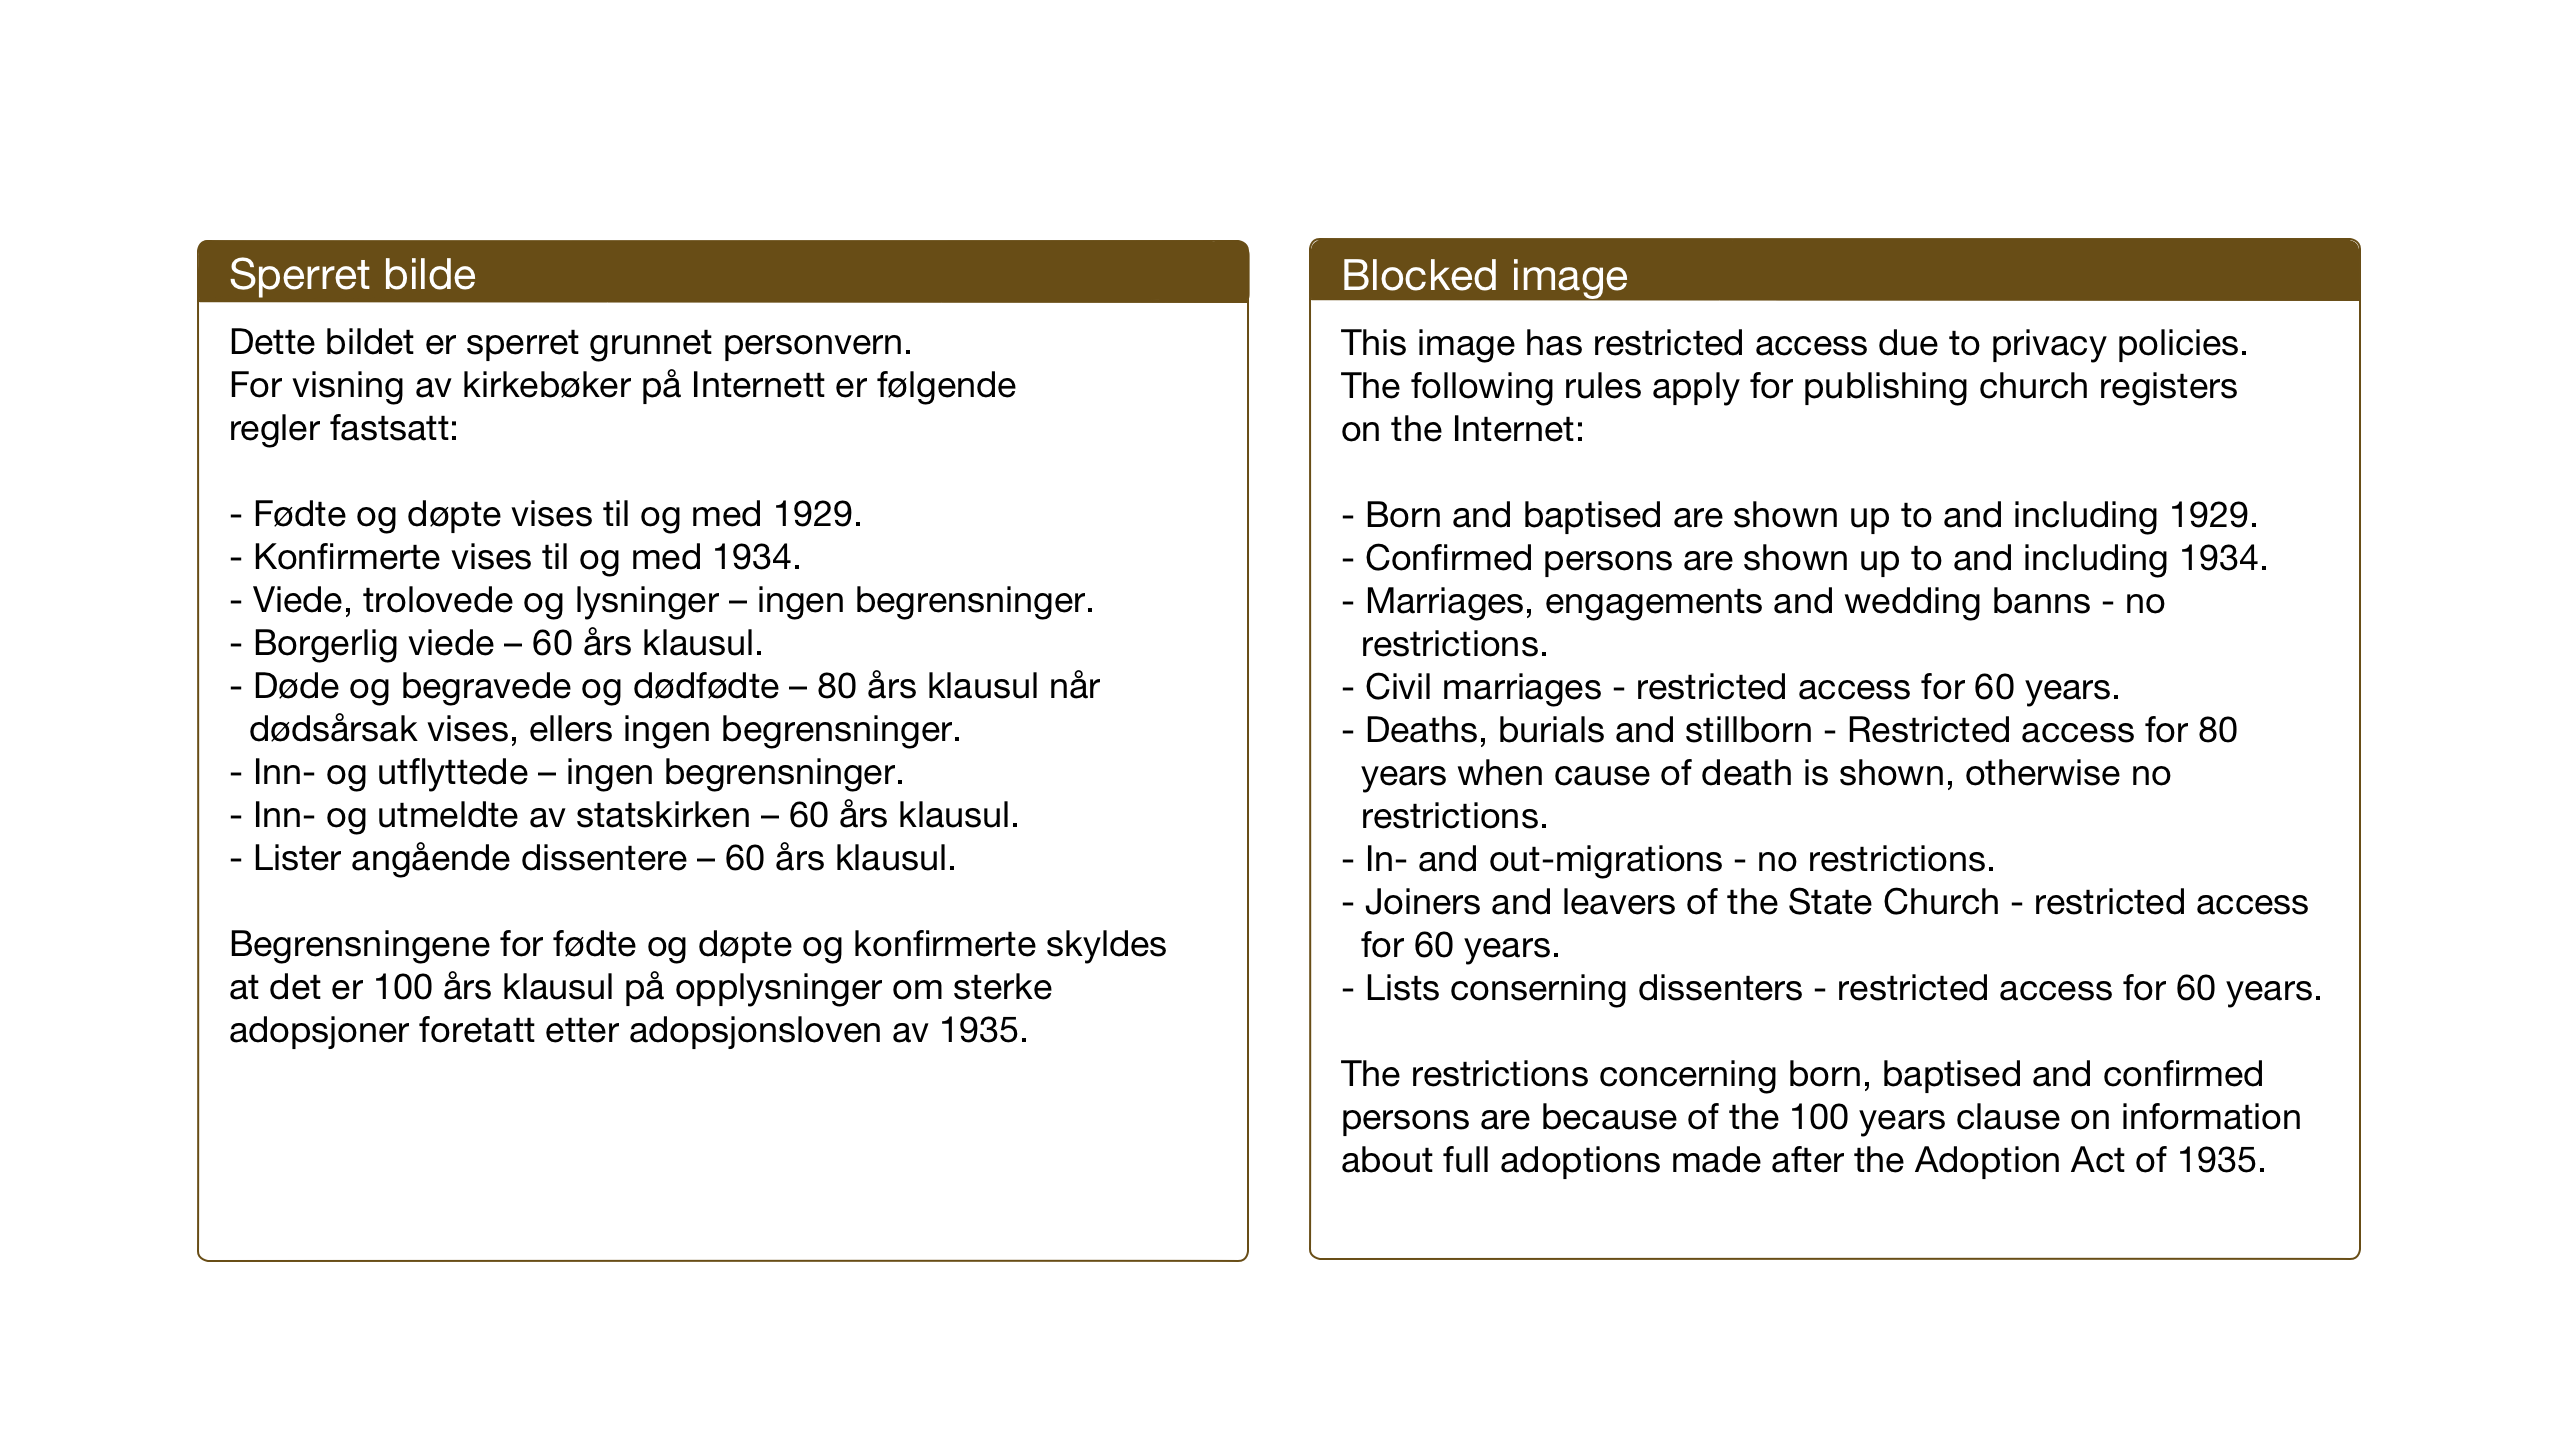 SAB, Domkirken Sokneprestembete, H/Haa: Ministerialbok nr. C 9, 1958-2001, s. 155b-156a